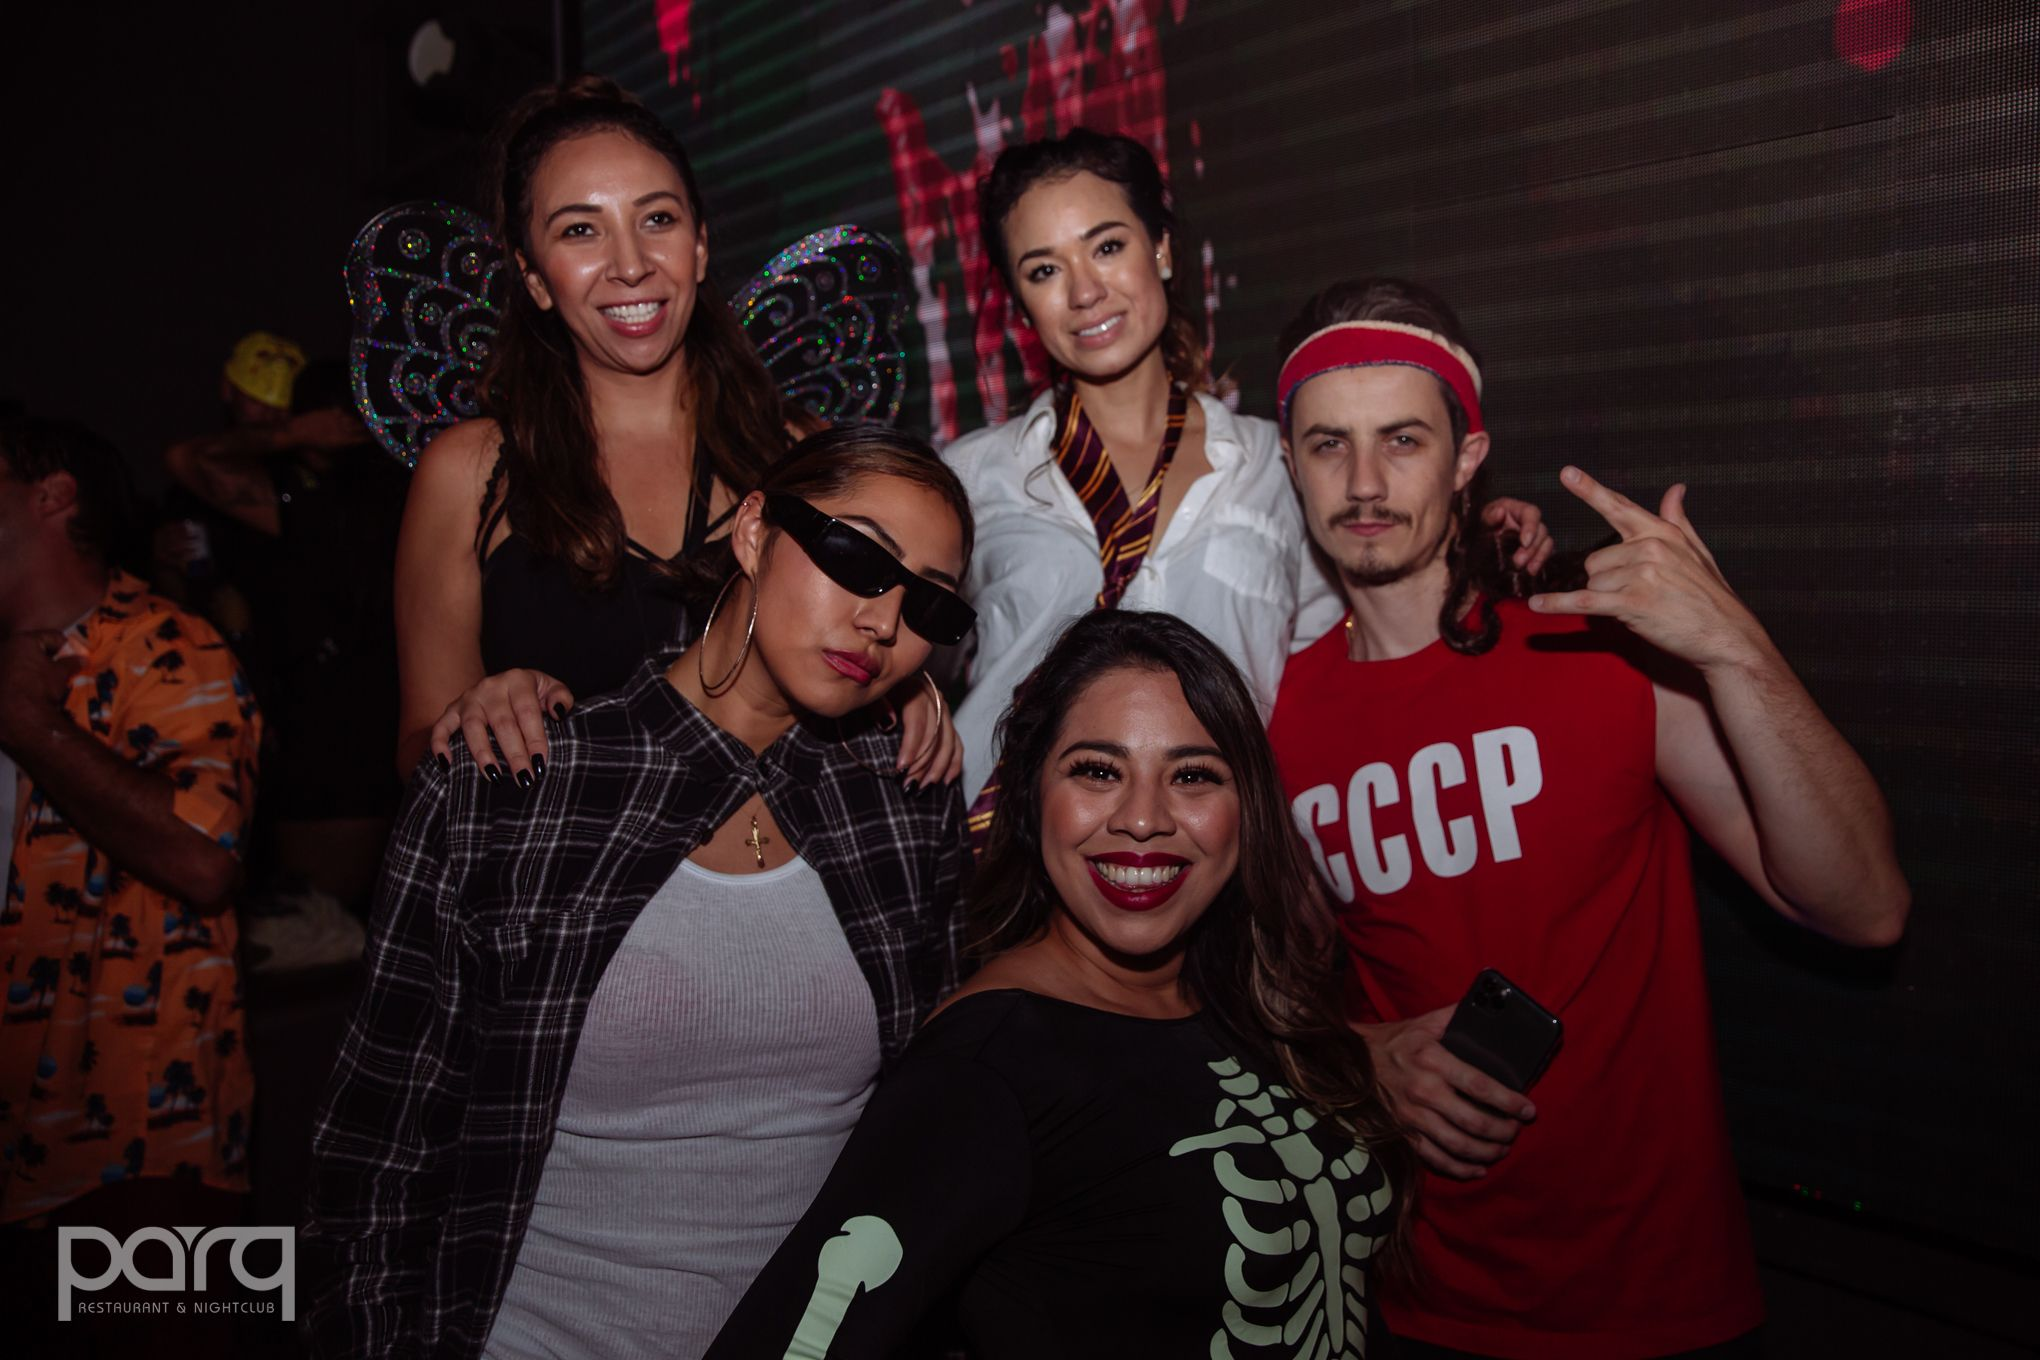 10.26.19 Parq - Halloween Gallery-22.jpg